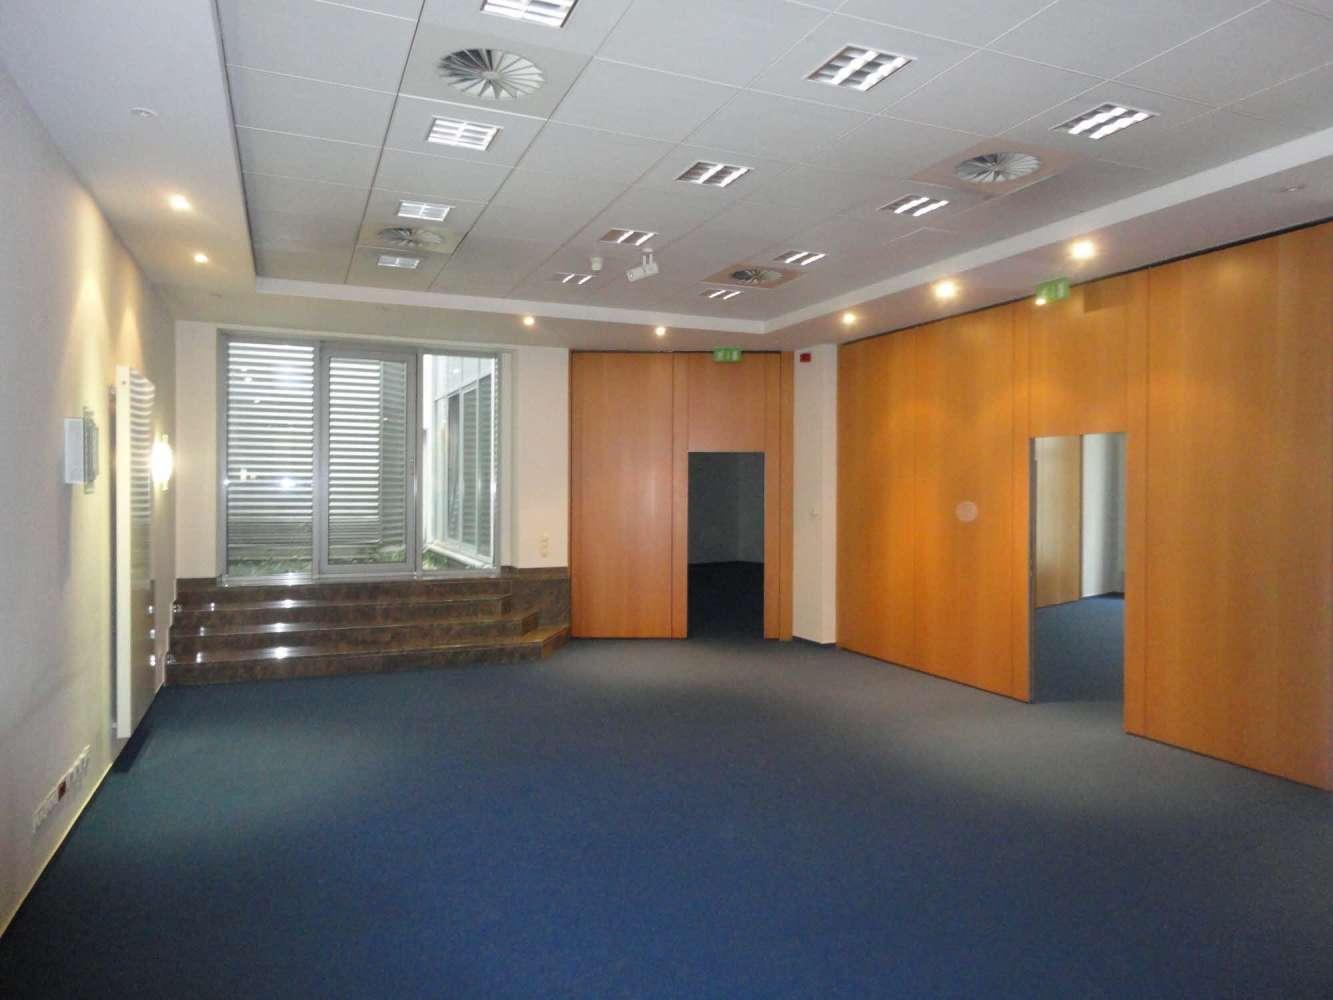 Büros Frankfurt am main, 60329 - Büro - Frankfurt am Main, Gutleutviertel - F0676 - 10553590